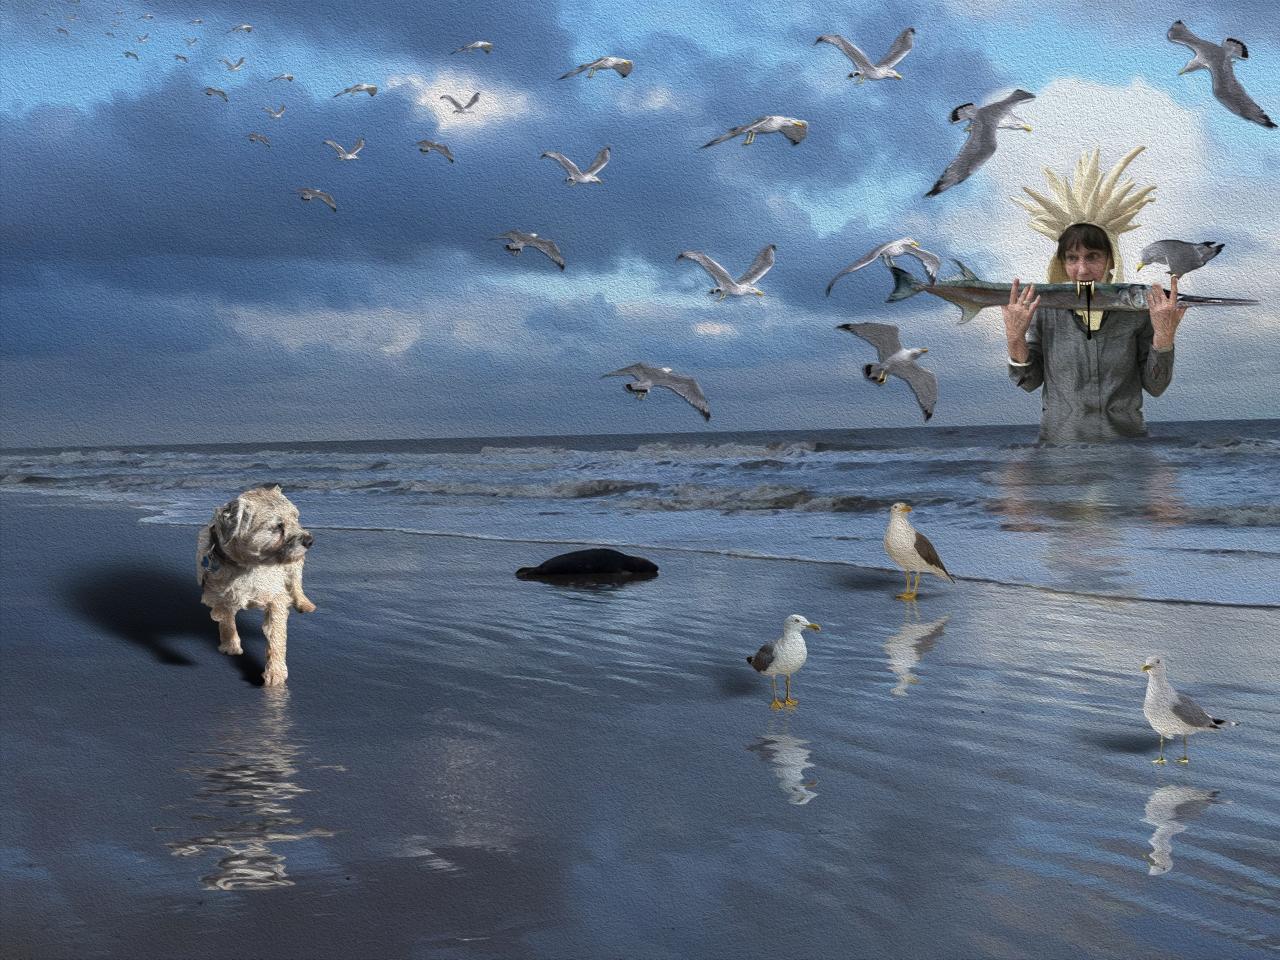 sally-sea-monster-gulls-1